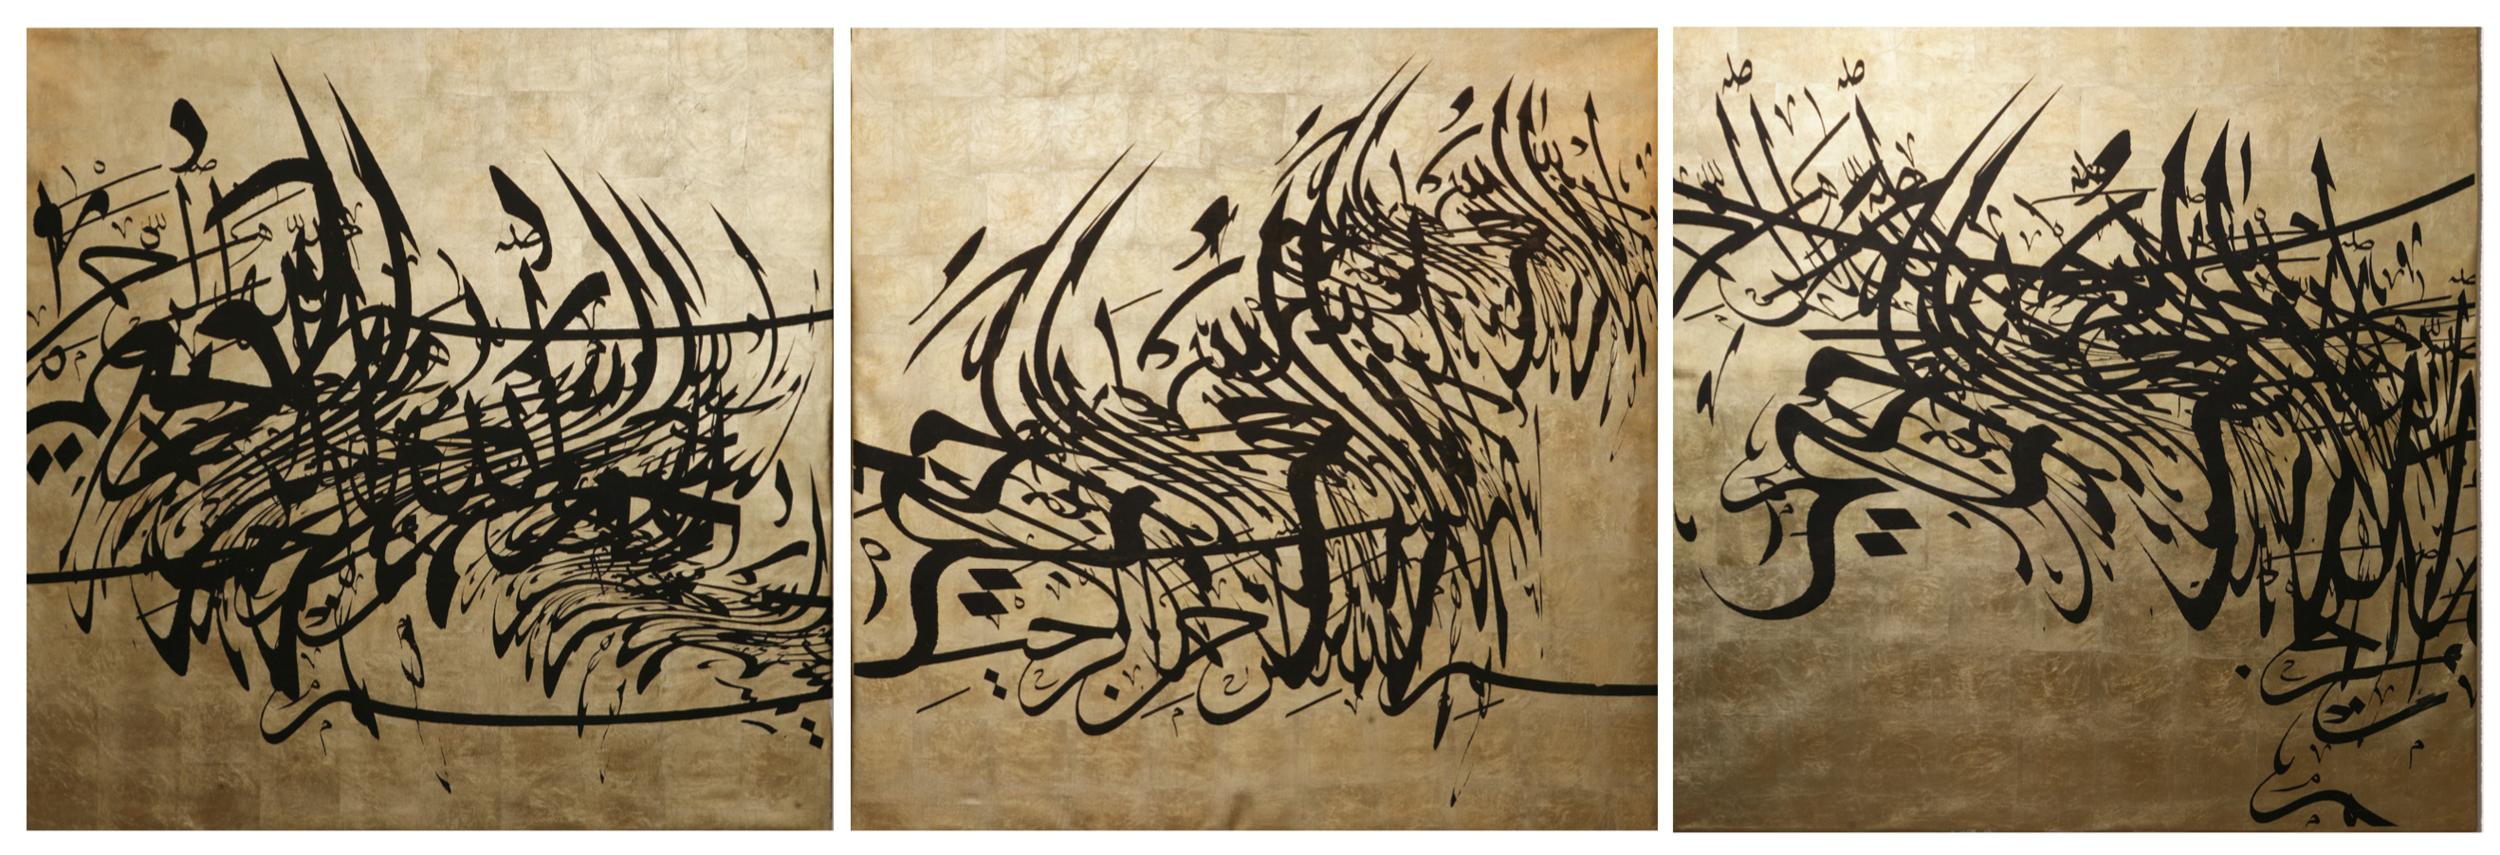 Wahib Chehata,  Triptyque , 2018, 150 x 150 cm, encre sur feuille d'or sur toile  © Wahib Chehata, Courtoisie A2Z Gallery